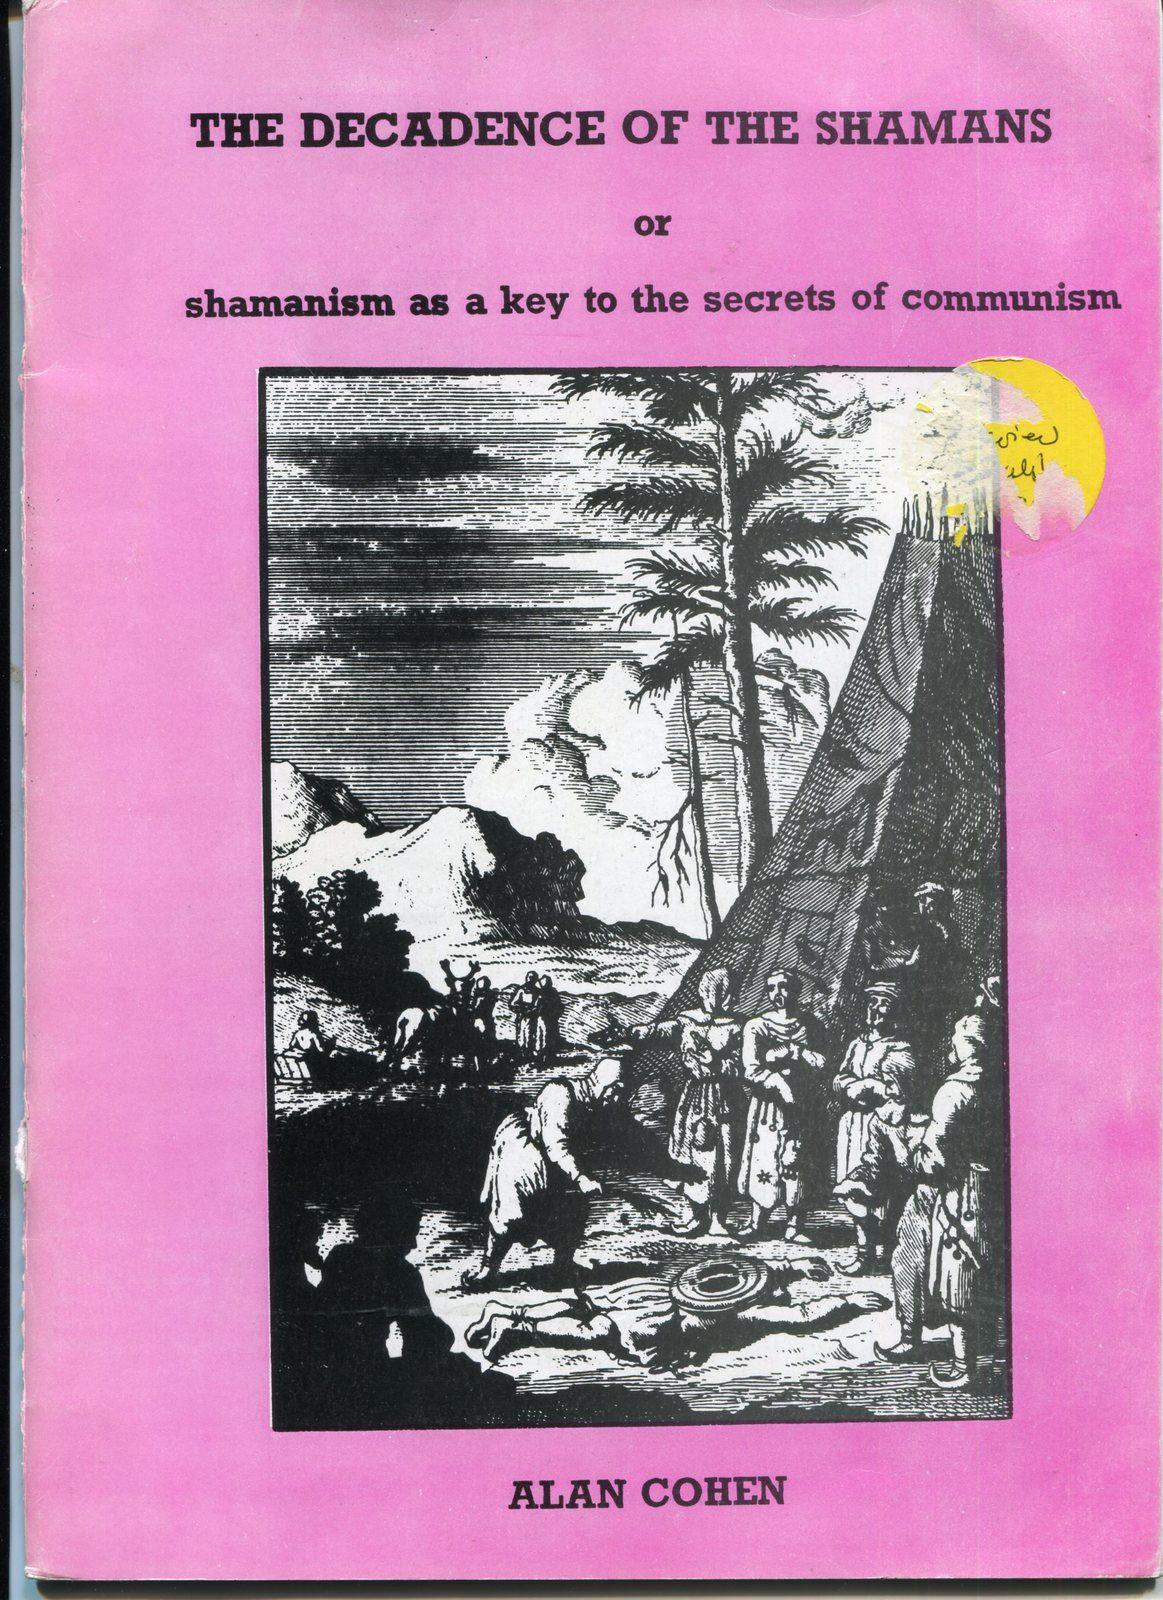 A mystical contribution to communism : shamanist commmunism, by Alan Cohen, 1991